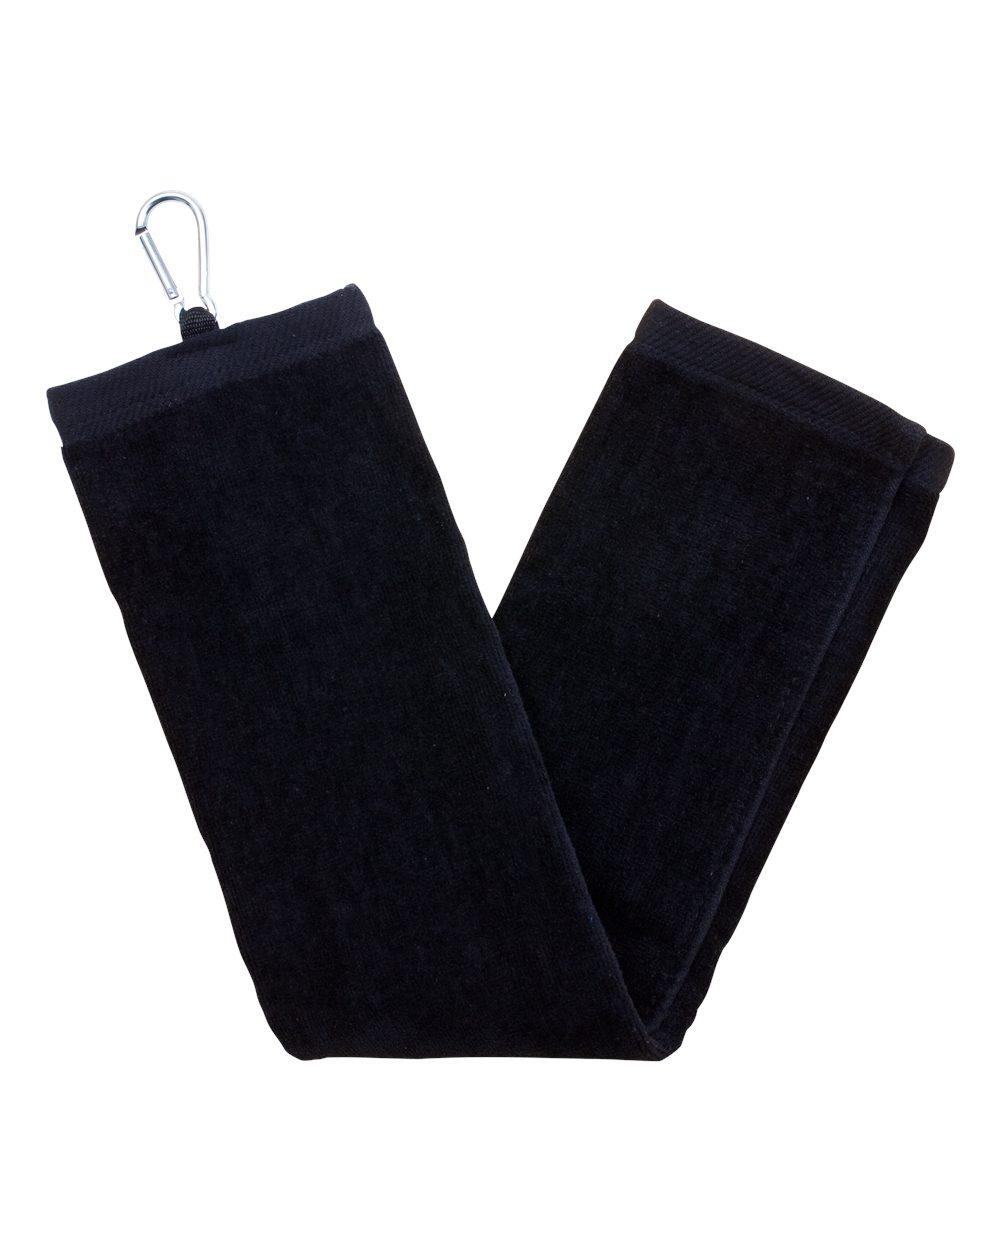 Carmel Towel Company C1624TC - Tri-Fold Velour Dobby Hemmed Hand Towel